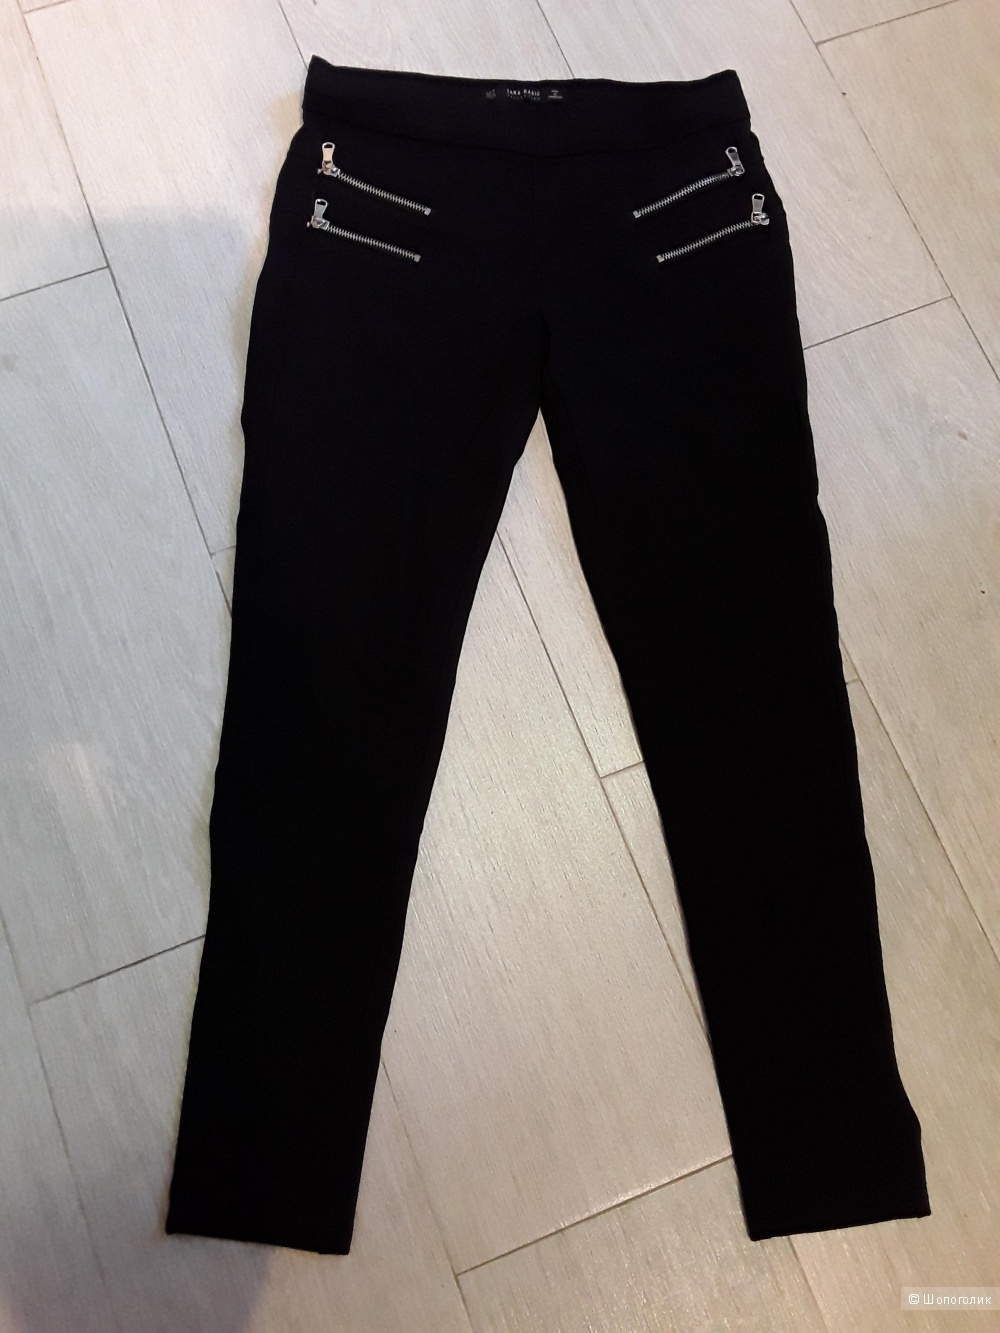 Леггинсы Zara размер M